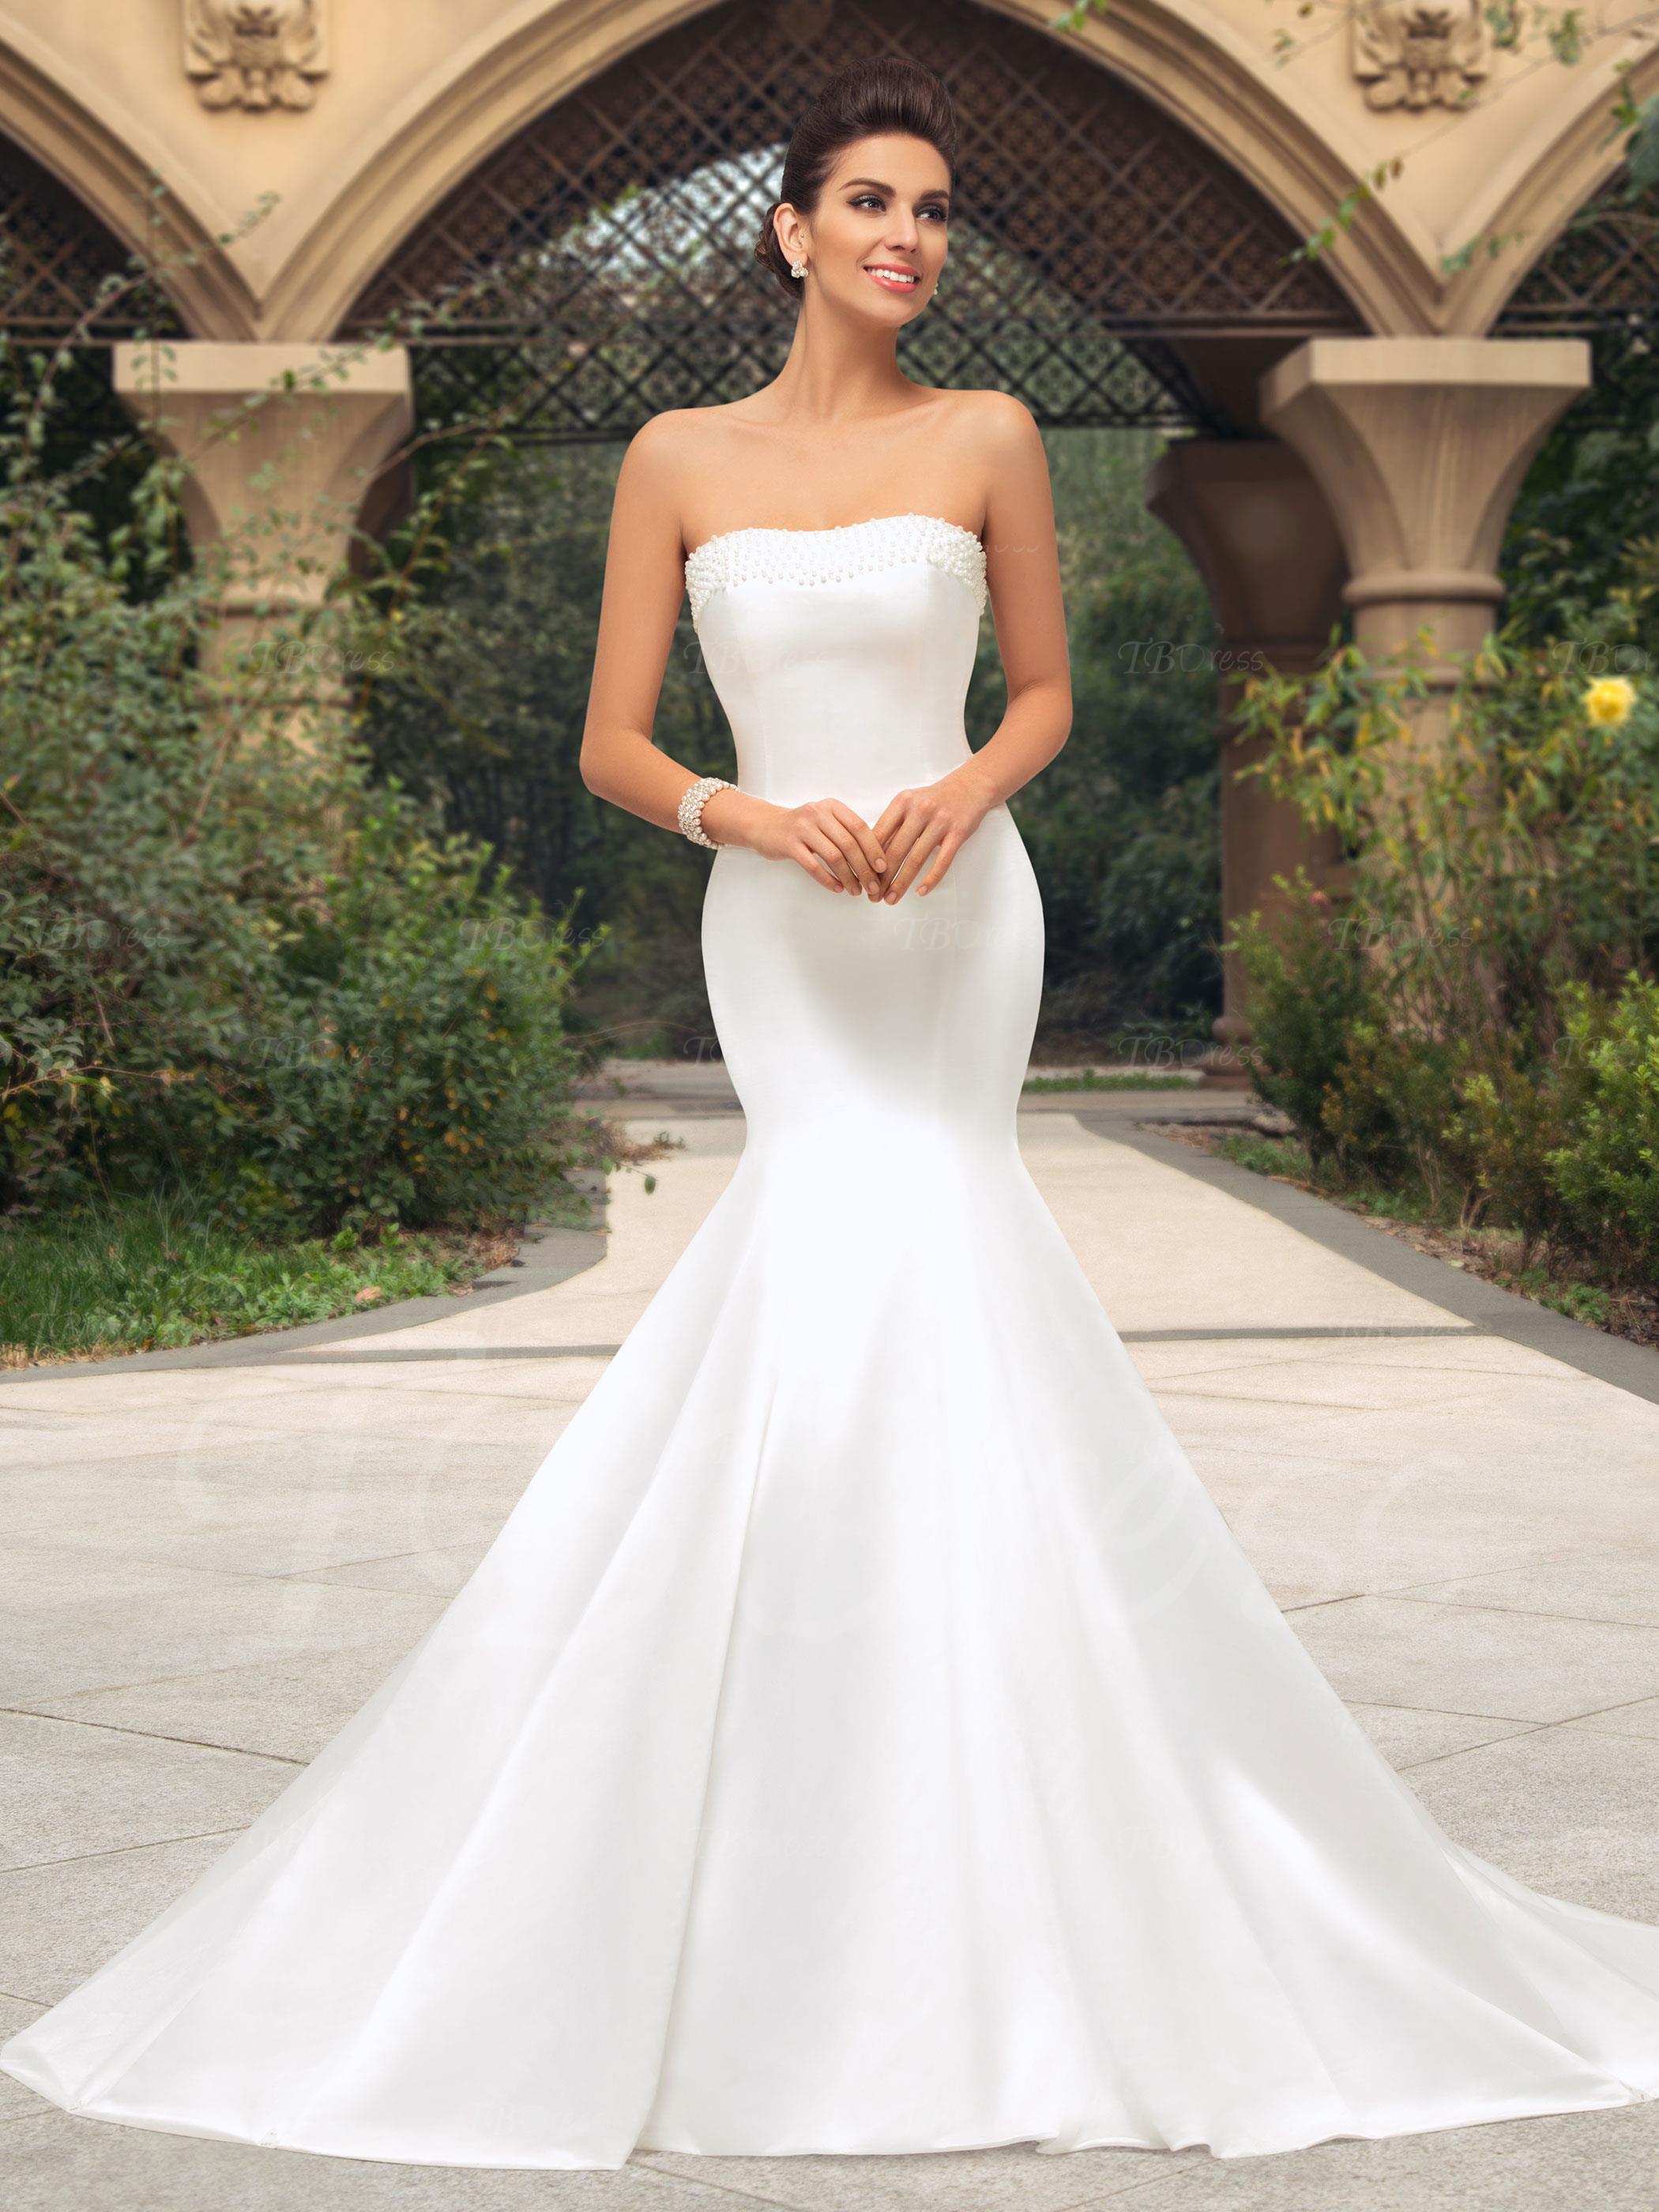 tbdress wedding dresses photo - 1